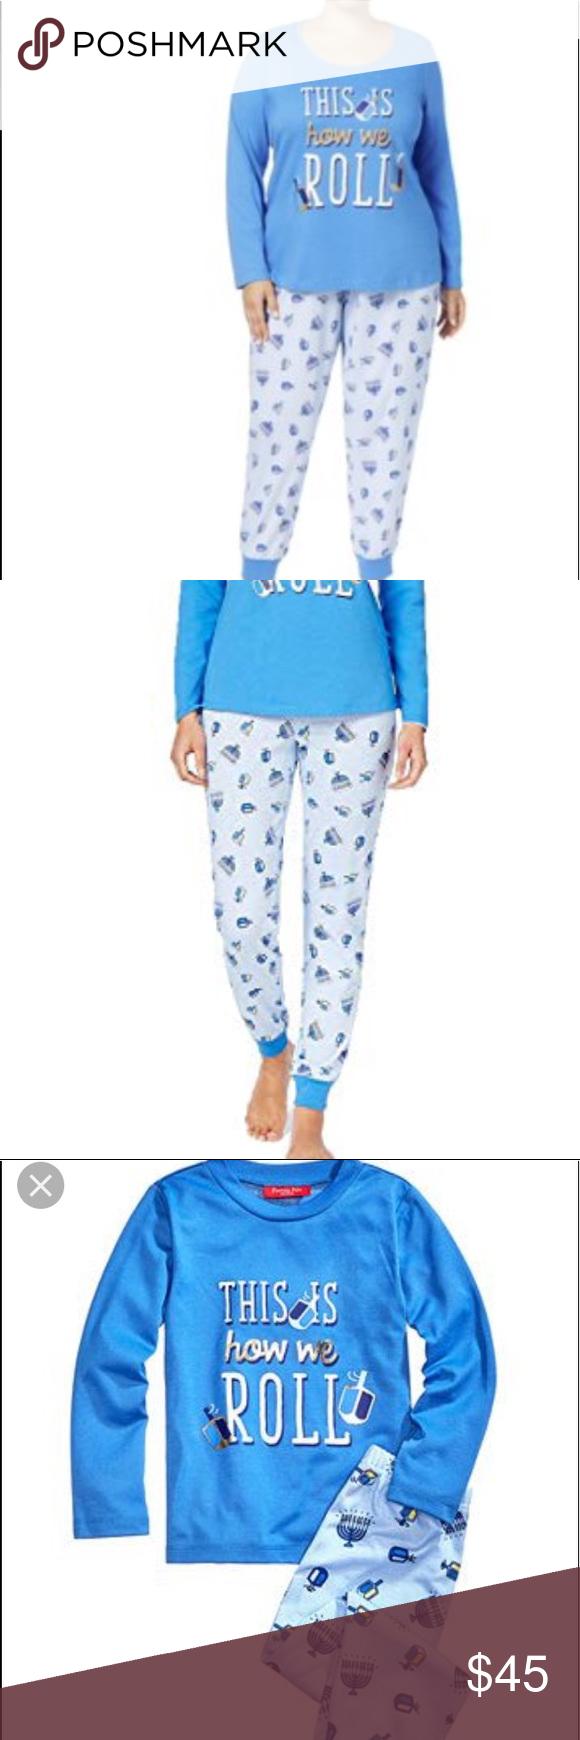 Women's Family Pjs size xxl Hanukkah Pajamas NWT NWT